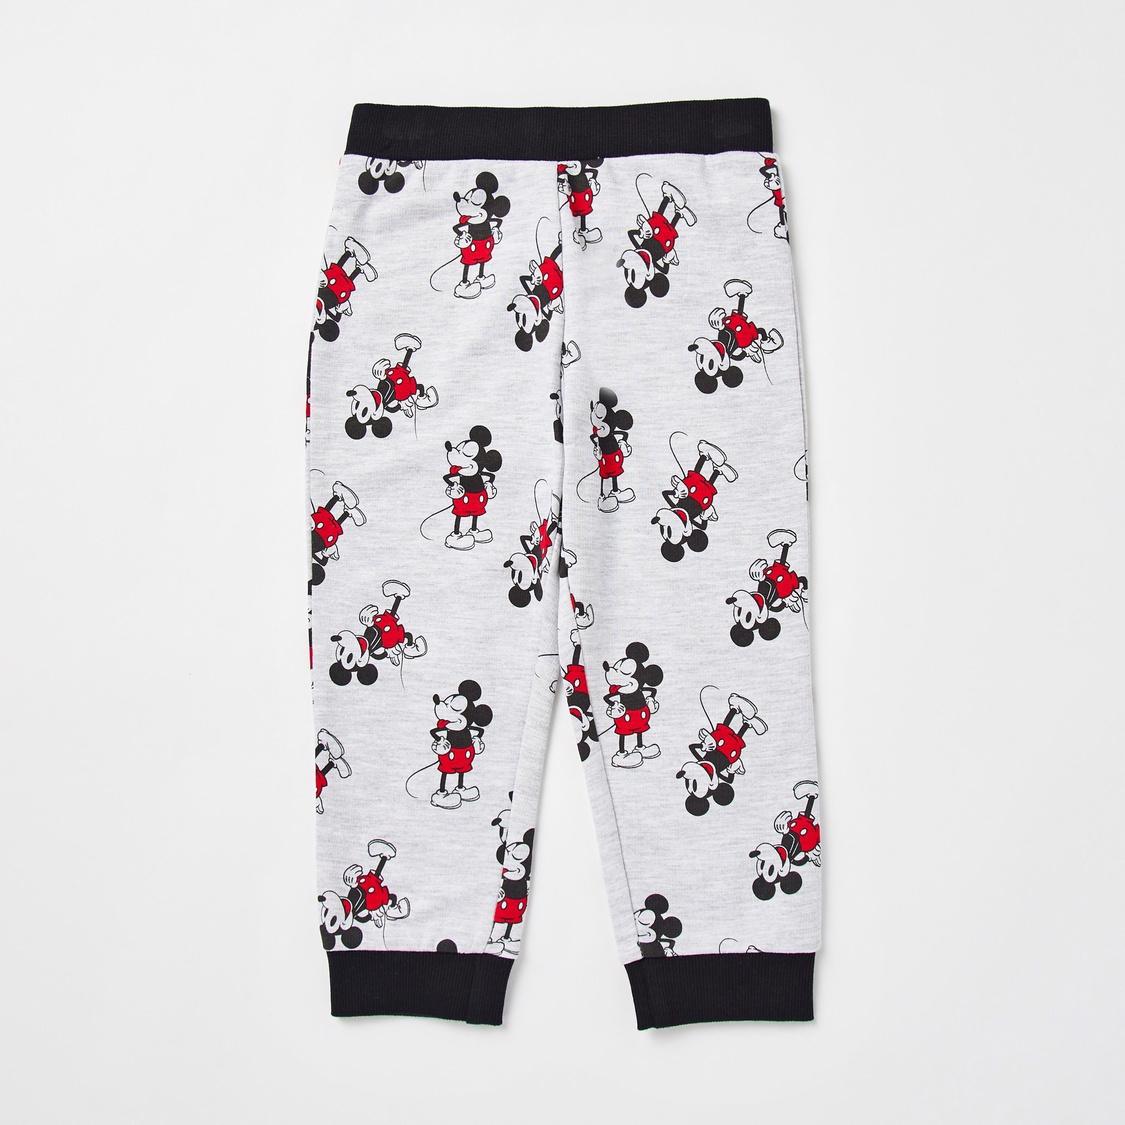 Mickey Mouse Print Long Sleeves Sweatshirt and Jog Pants Set